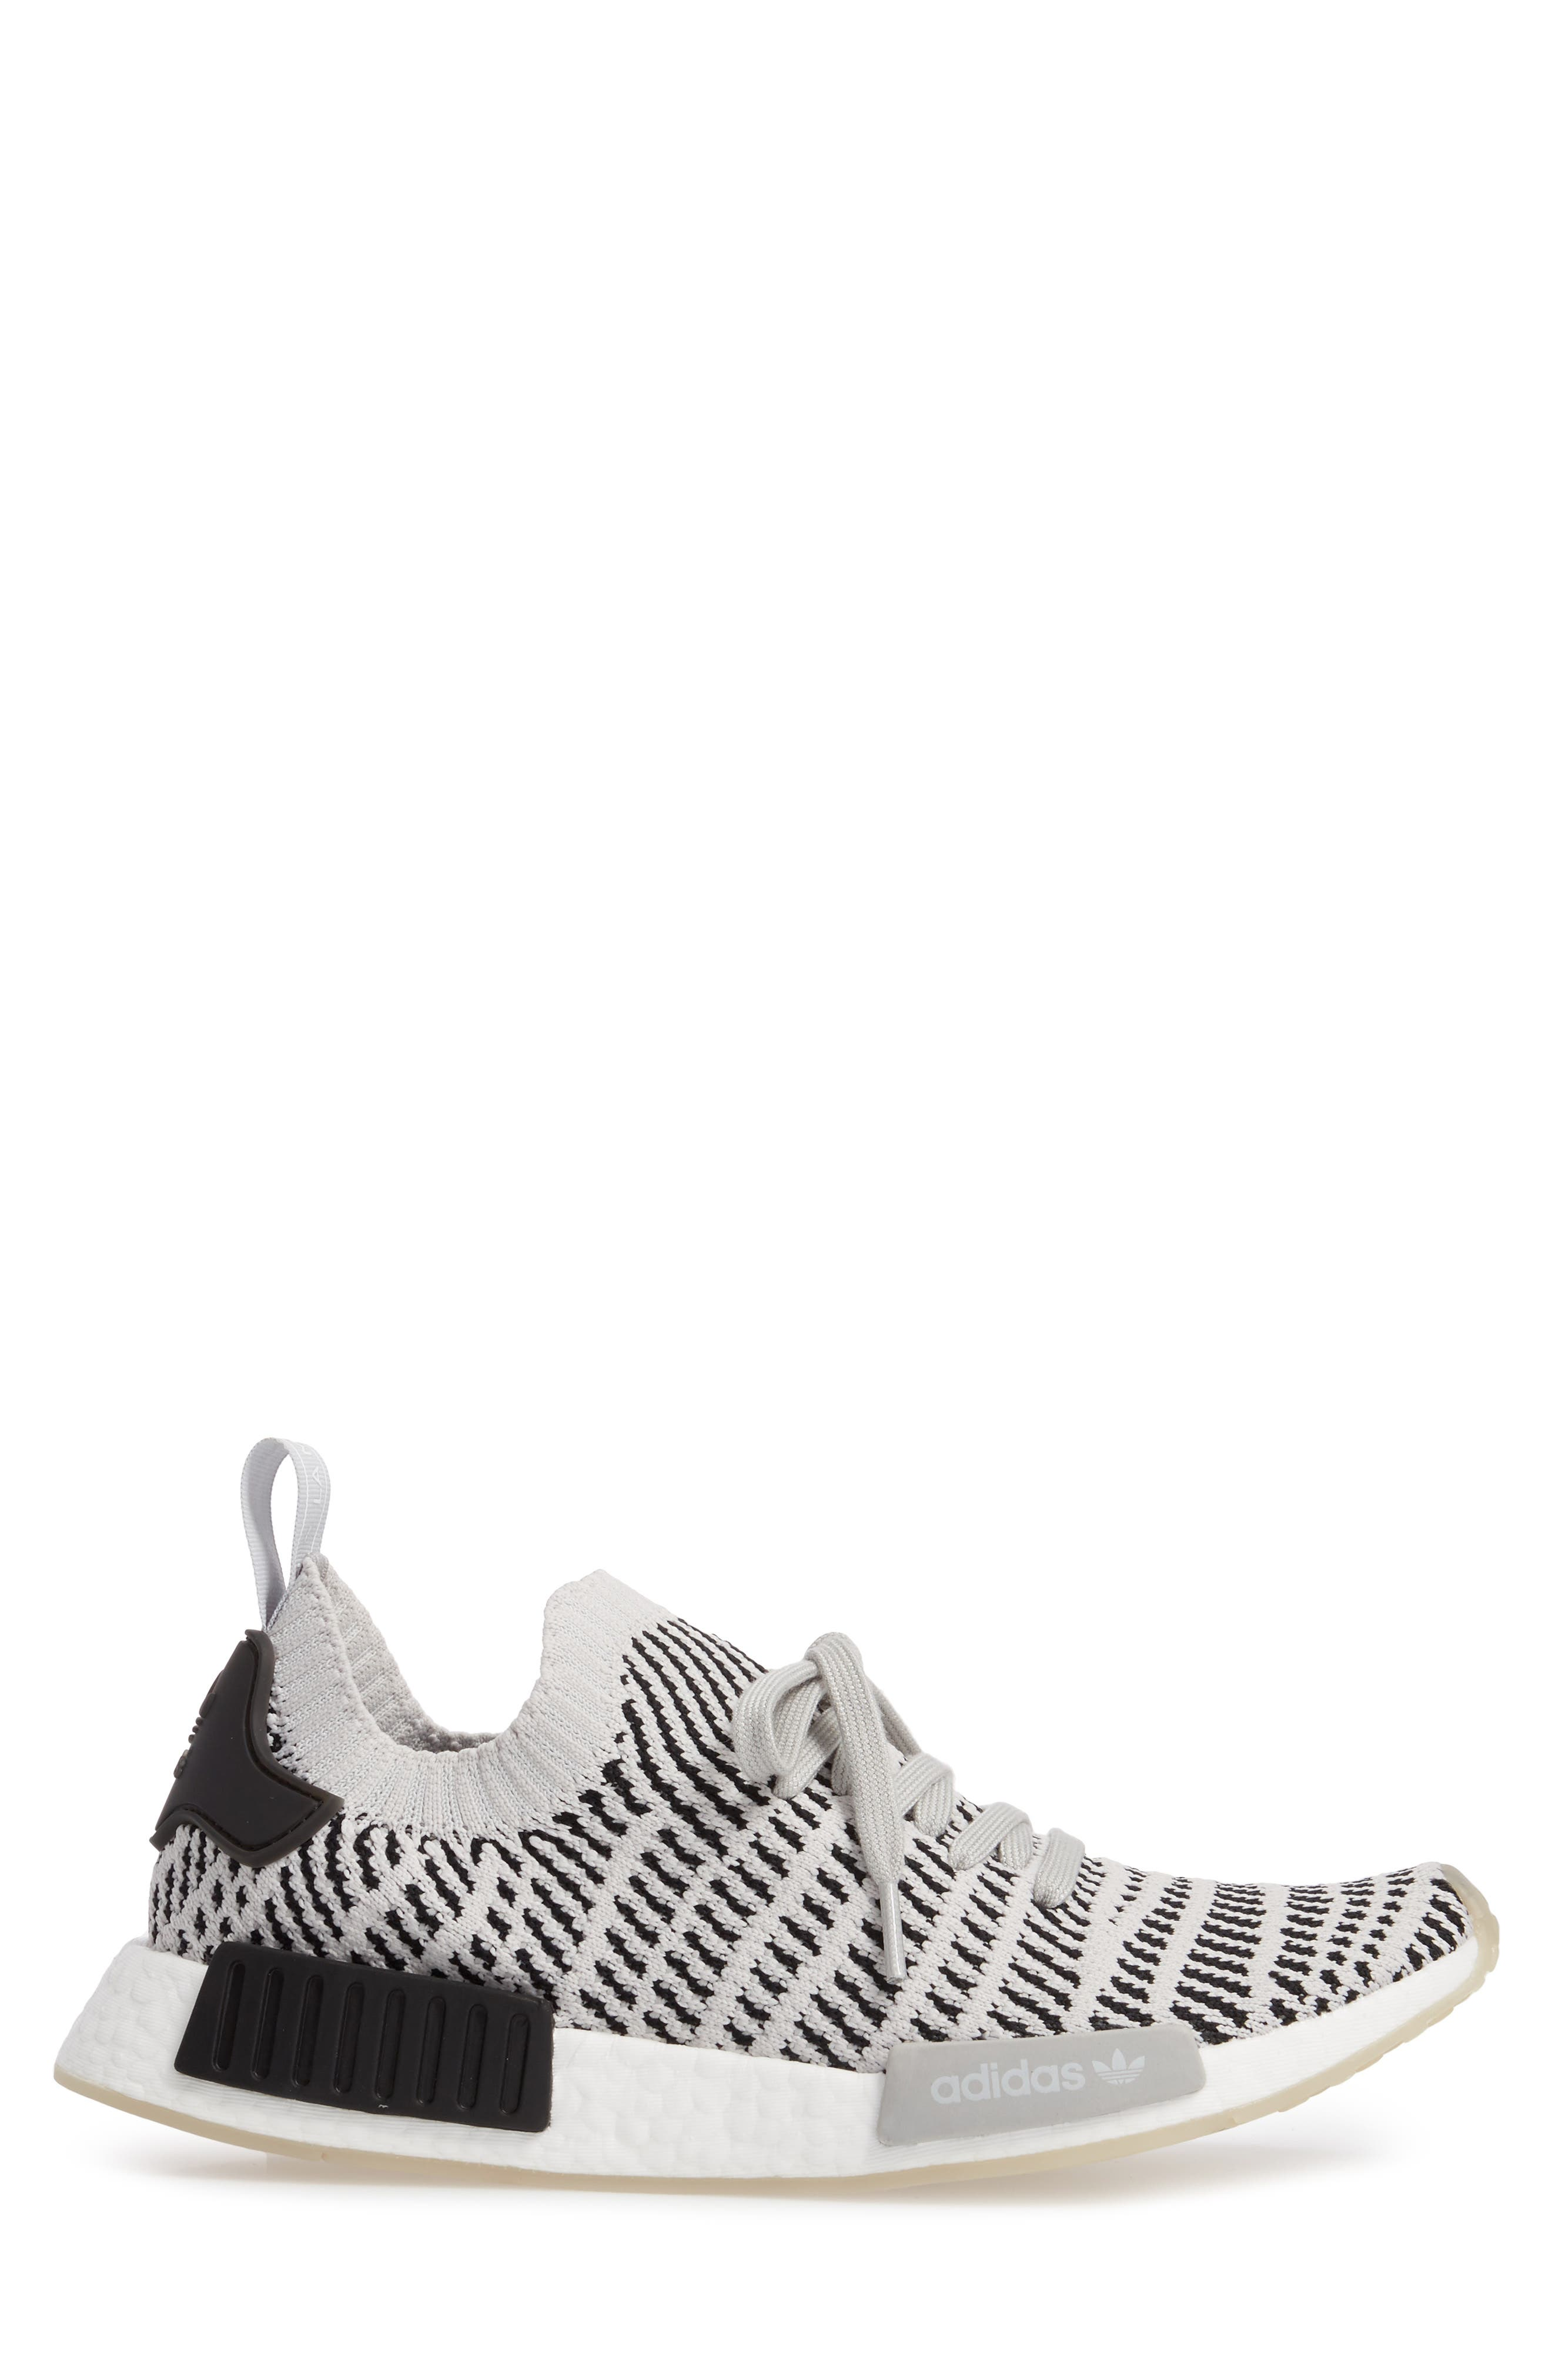 NMD R1 STLT Primeknit Sneaker,                             Alternate thumbnail 3, color,                             Grey/ Core Black